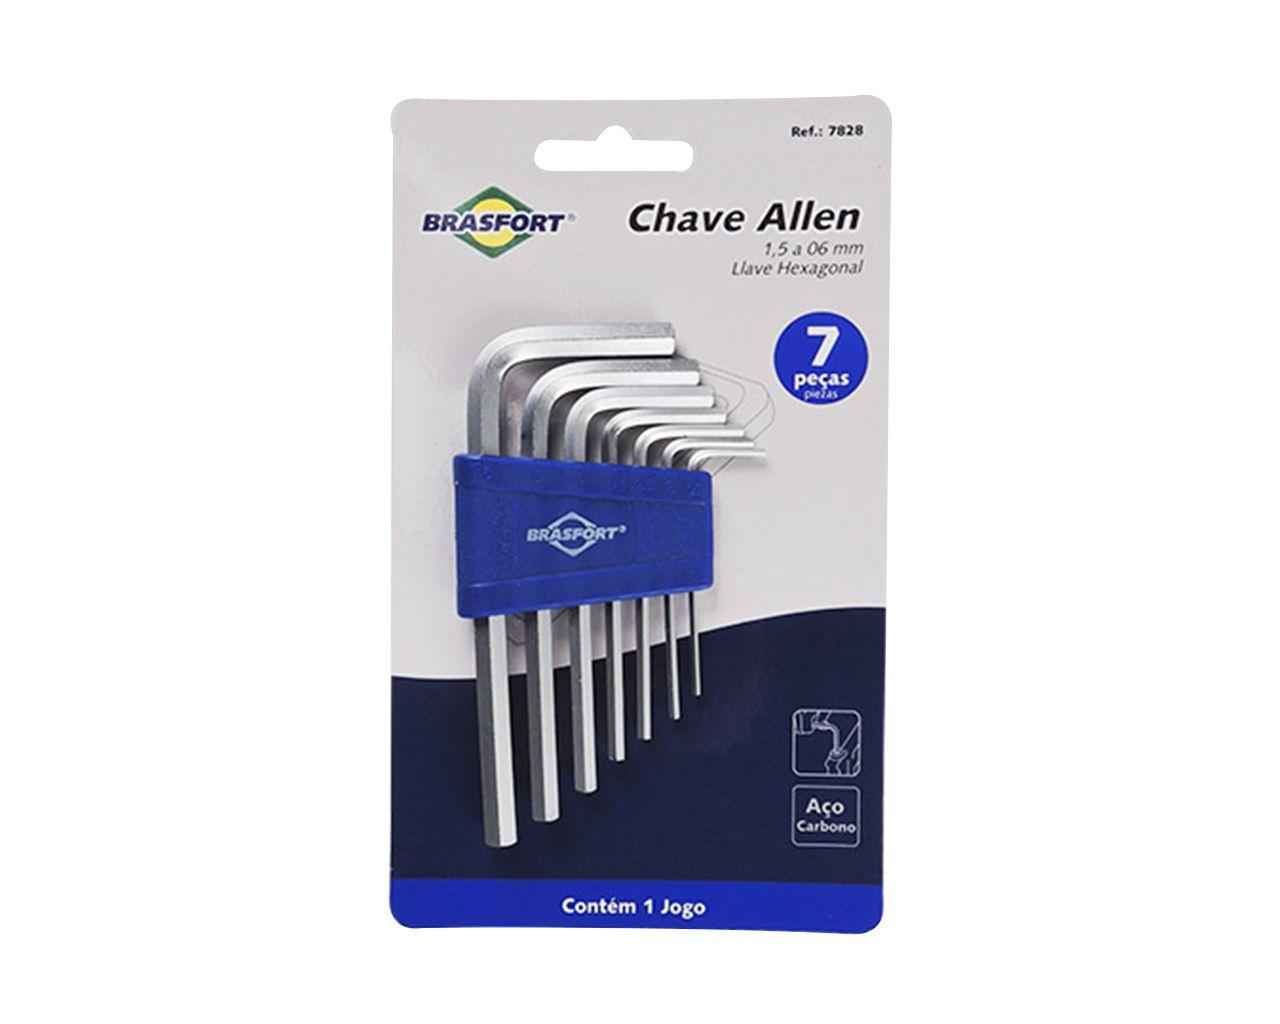 Chave Allen  - Tambory Online